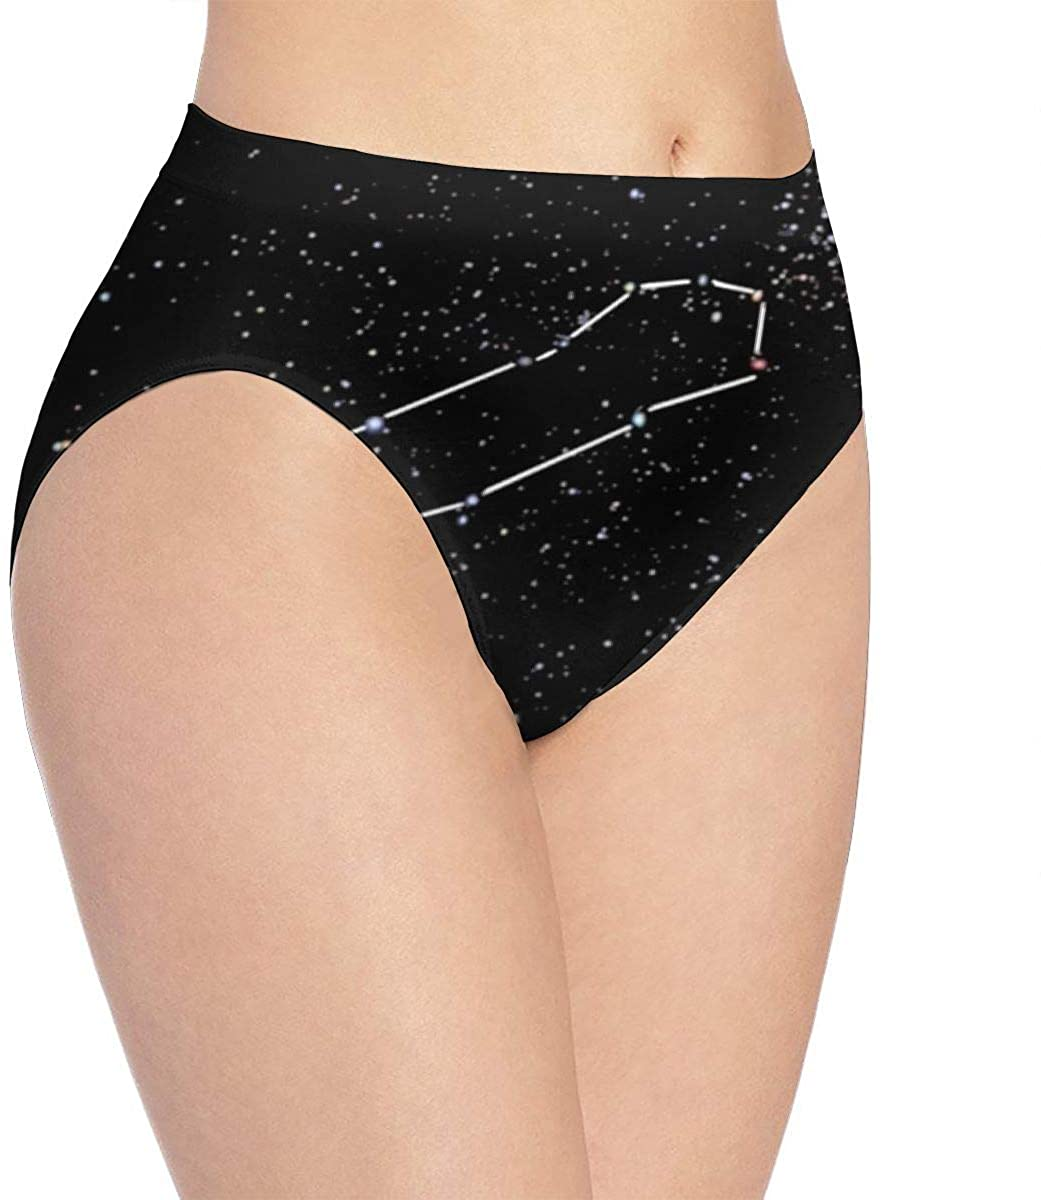 FTHX Penis Constellation Womens Underwear Panties Sexy Briefs Underpants Knickers